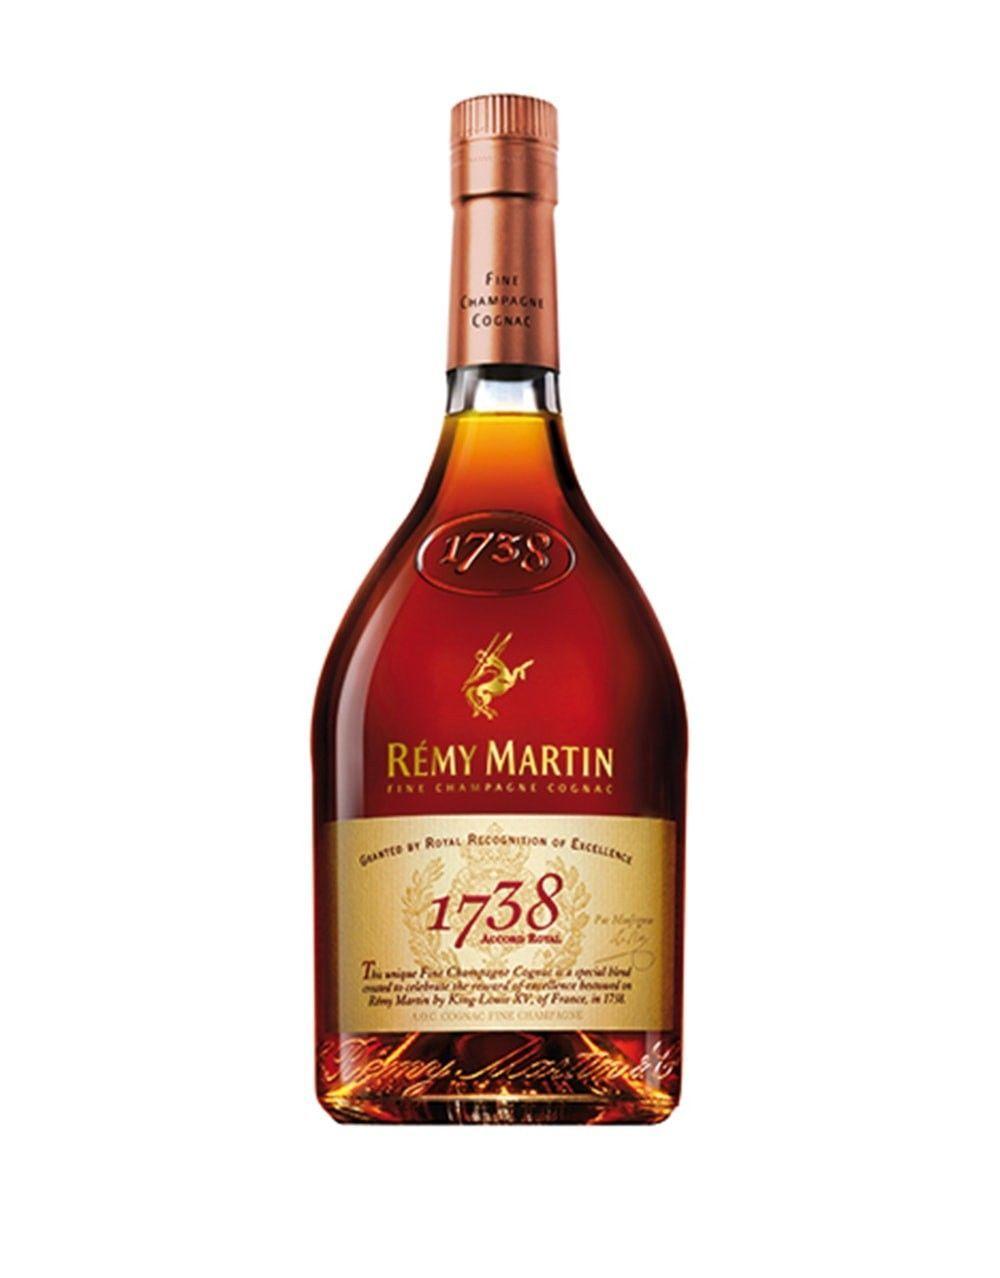 Remy Martin 1738 Accord Royal Remy Martin Bottle Champagne Gift Set